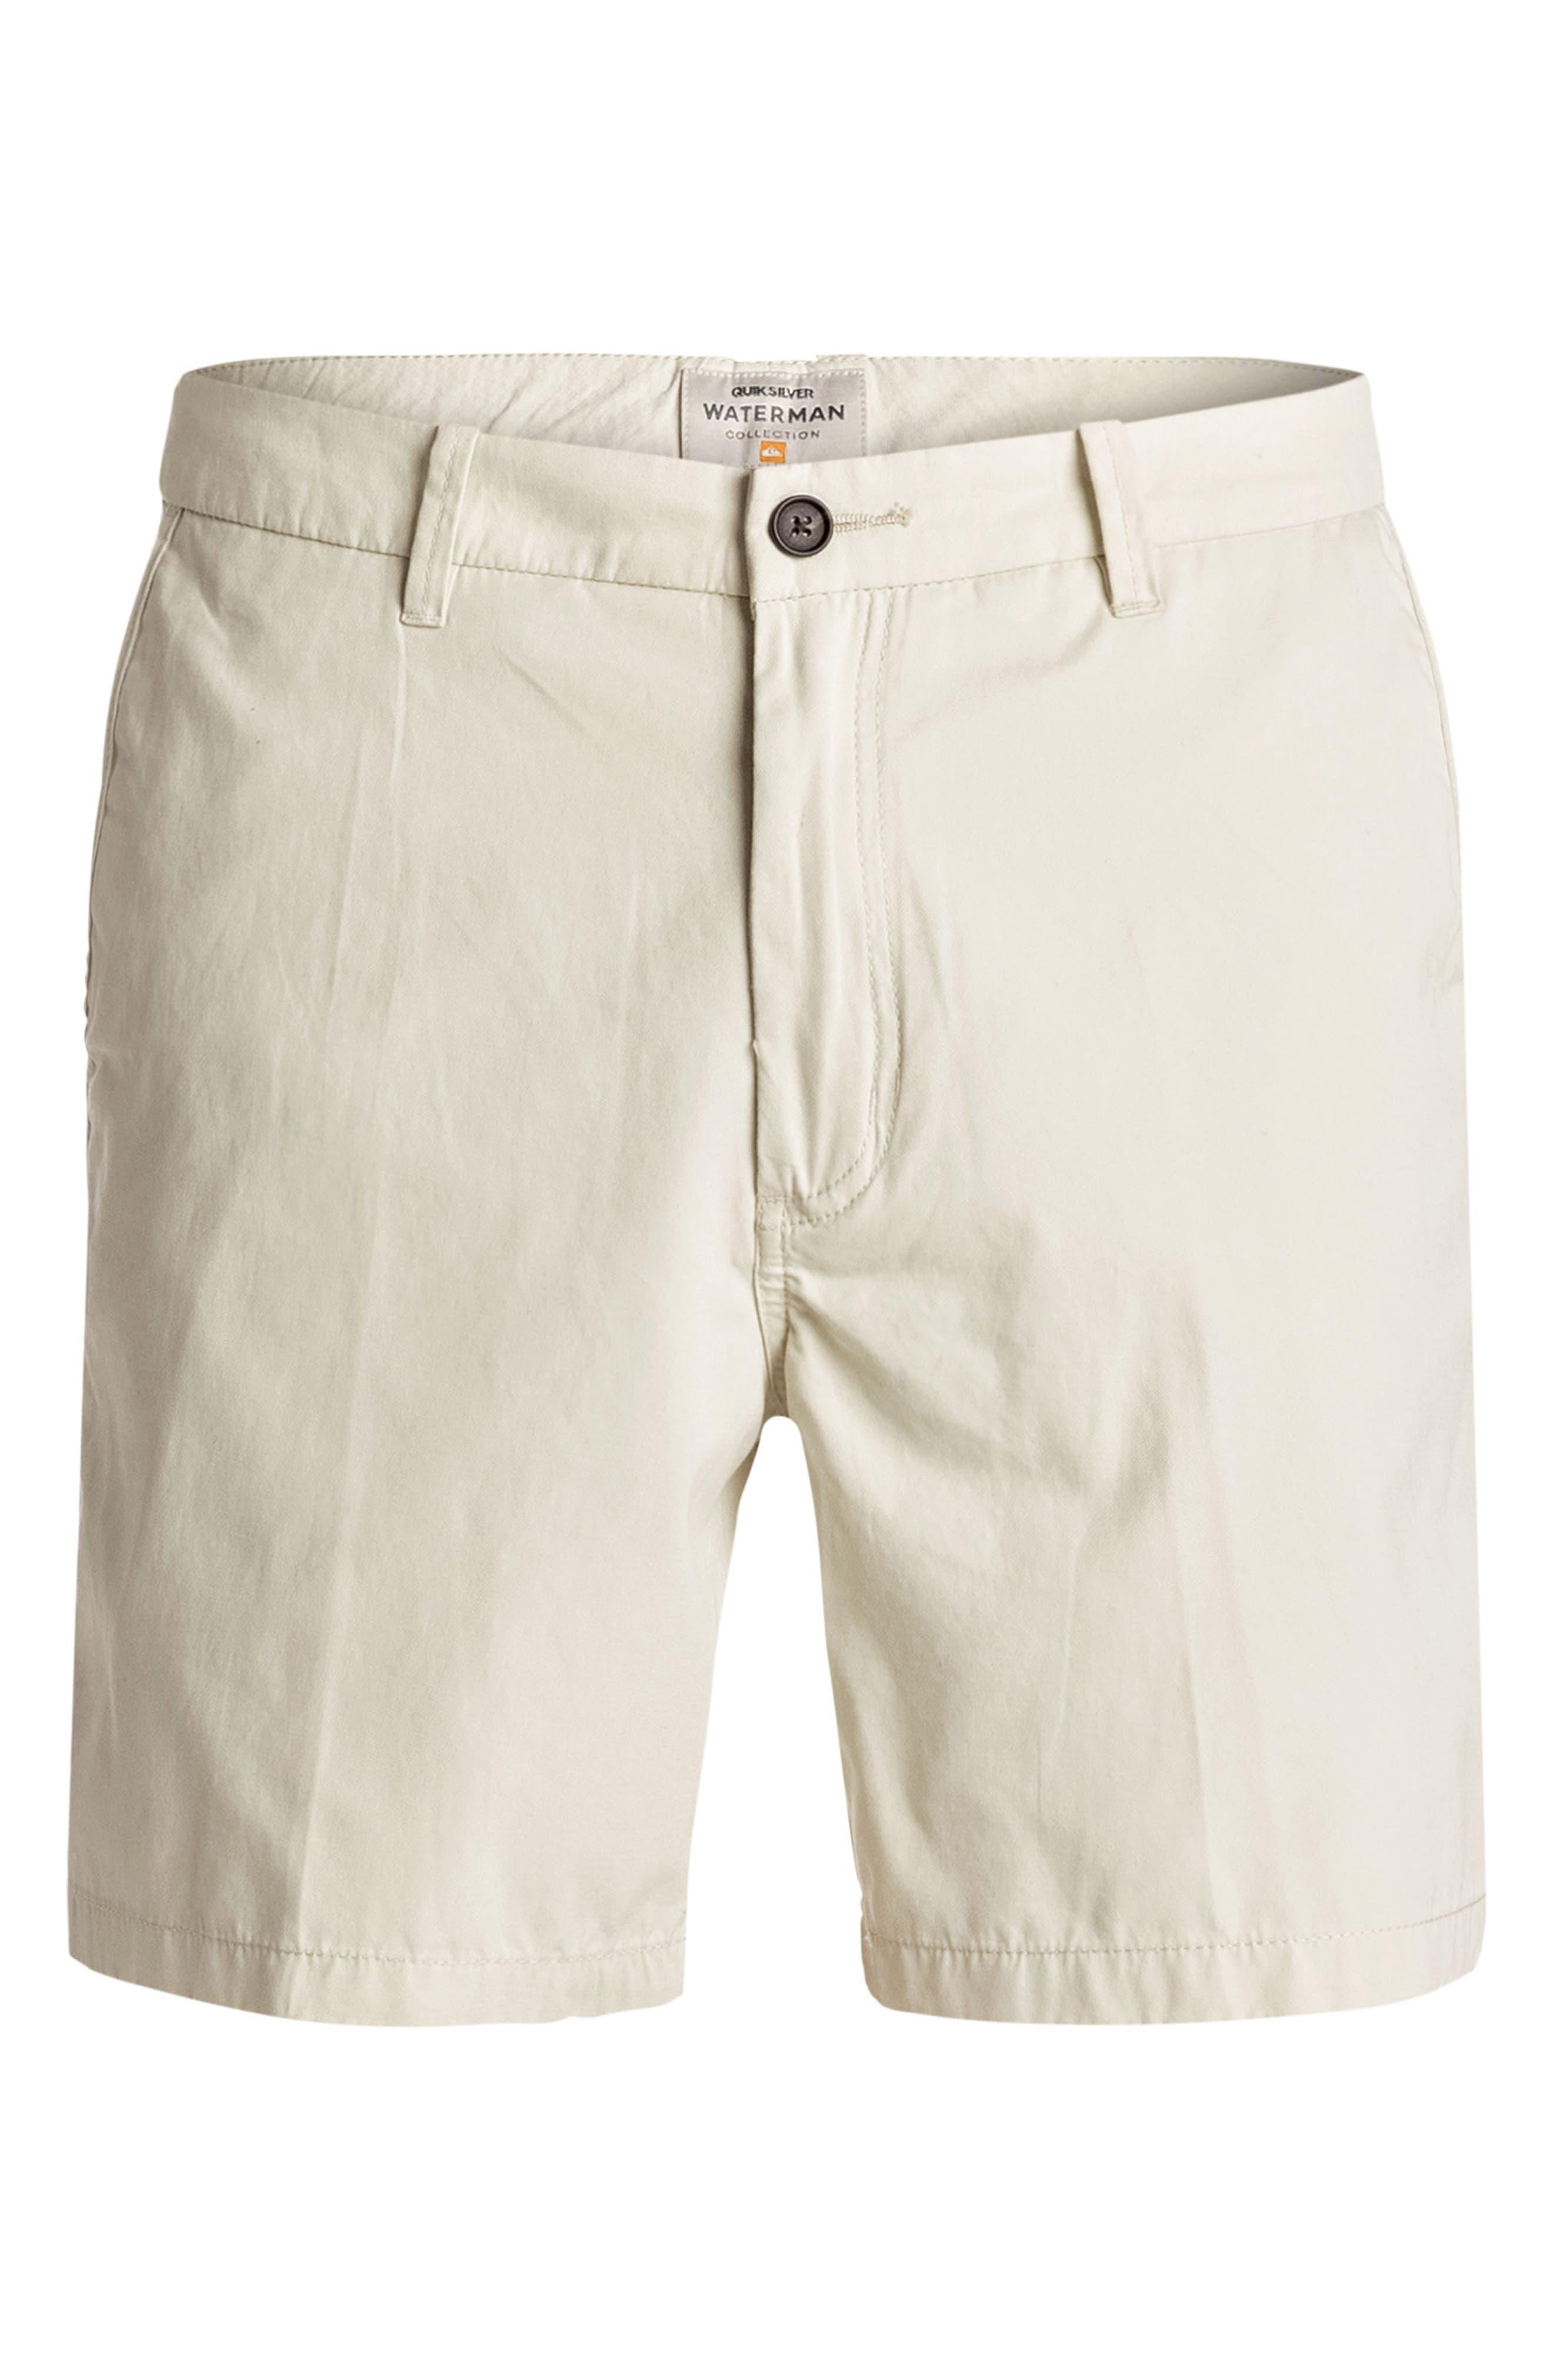 Shortie Chino Shorts,                             Alternate thumbnail 6, color,                             108